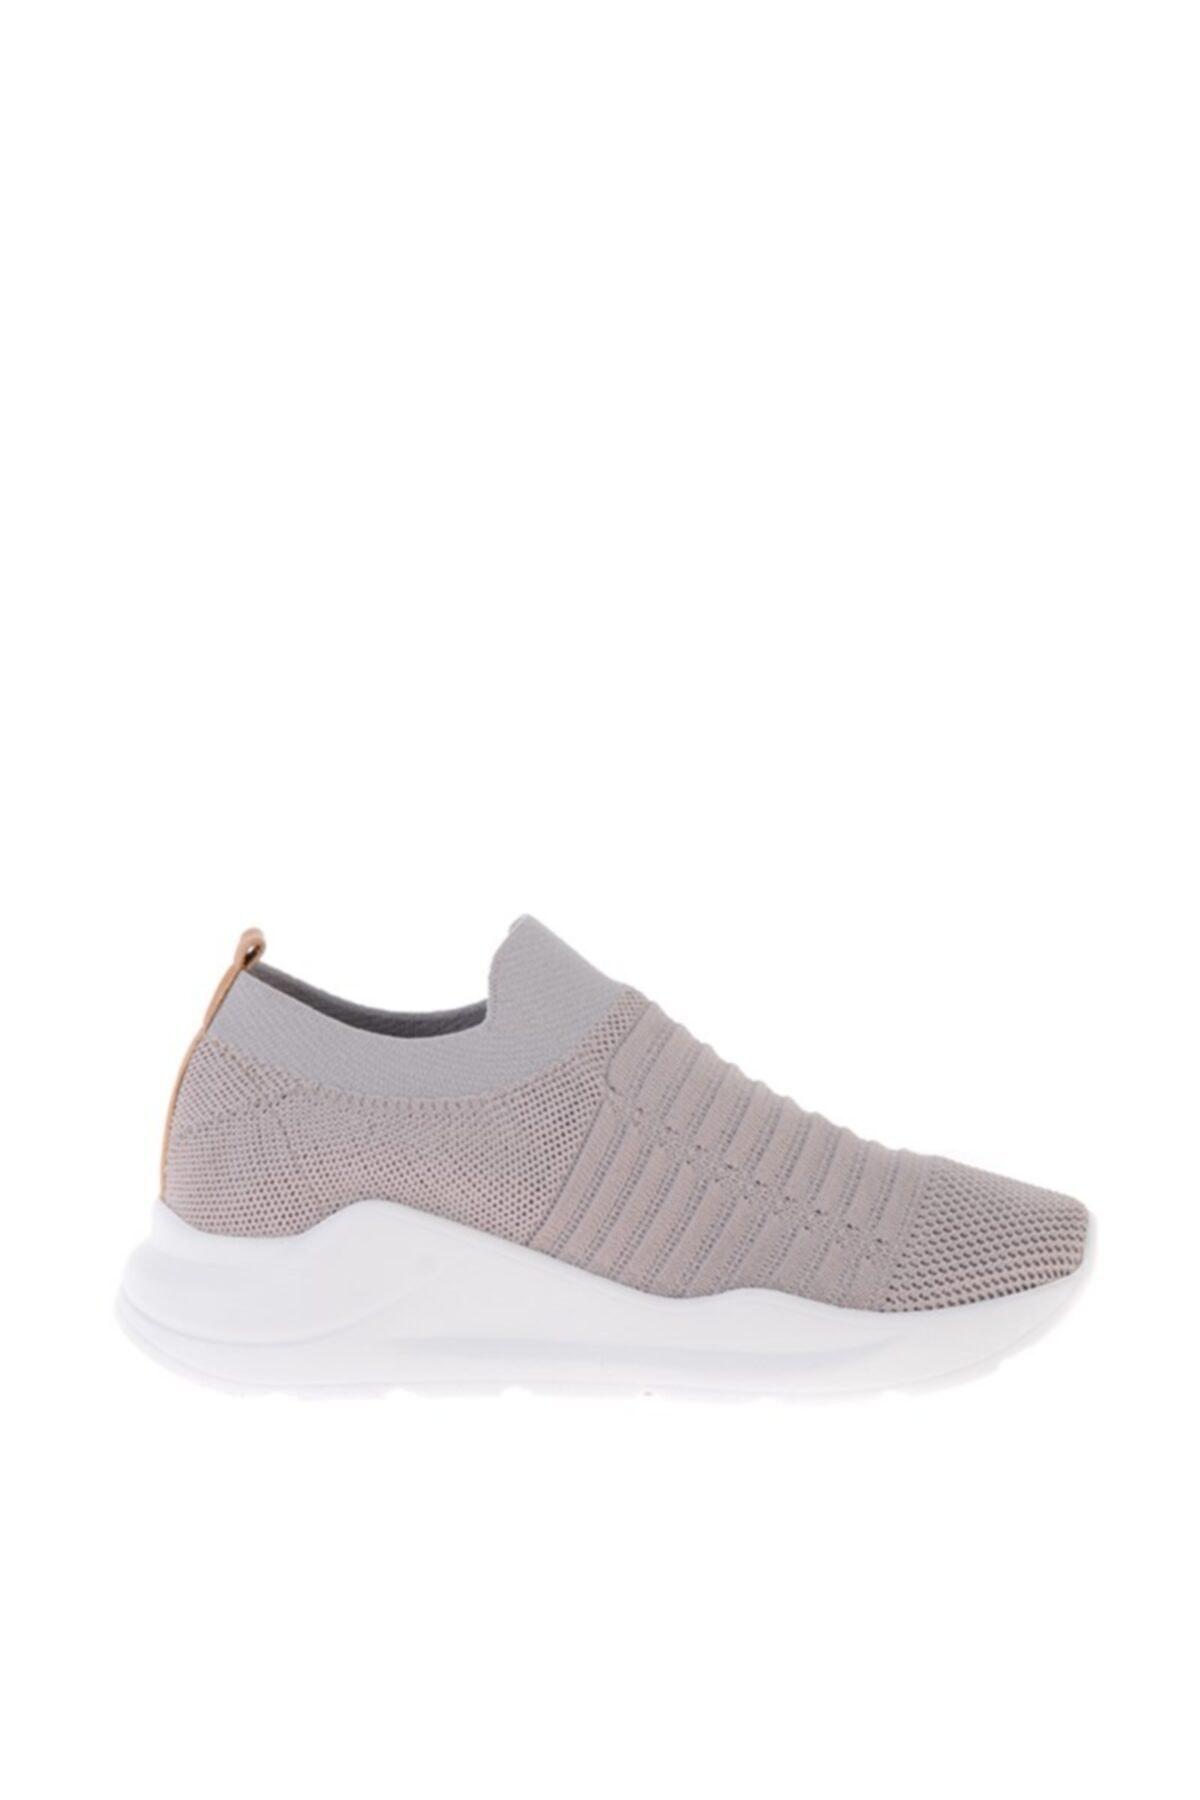 Bambi Gri Kadın Sneaker K01673050582 2